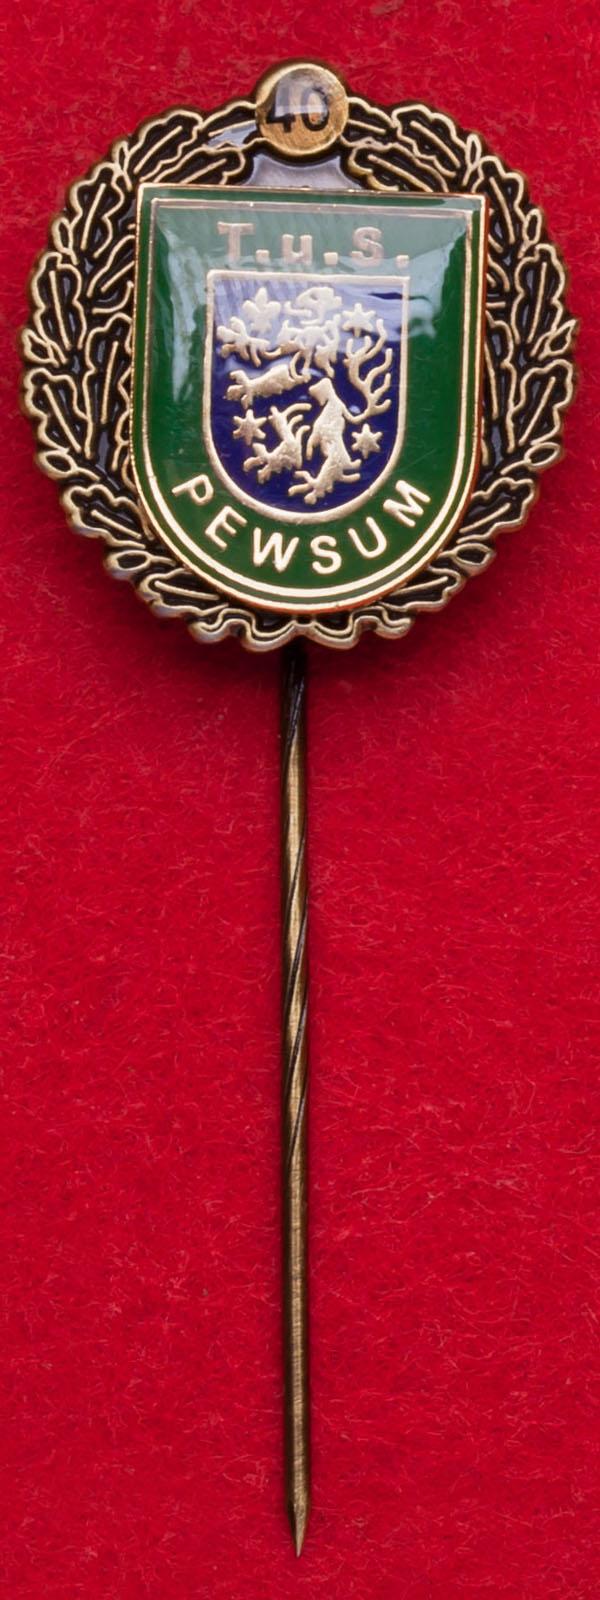 "Значок ""40 лет спортивному клубу T.u.S. Pewsum"", Германия"